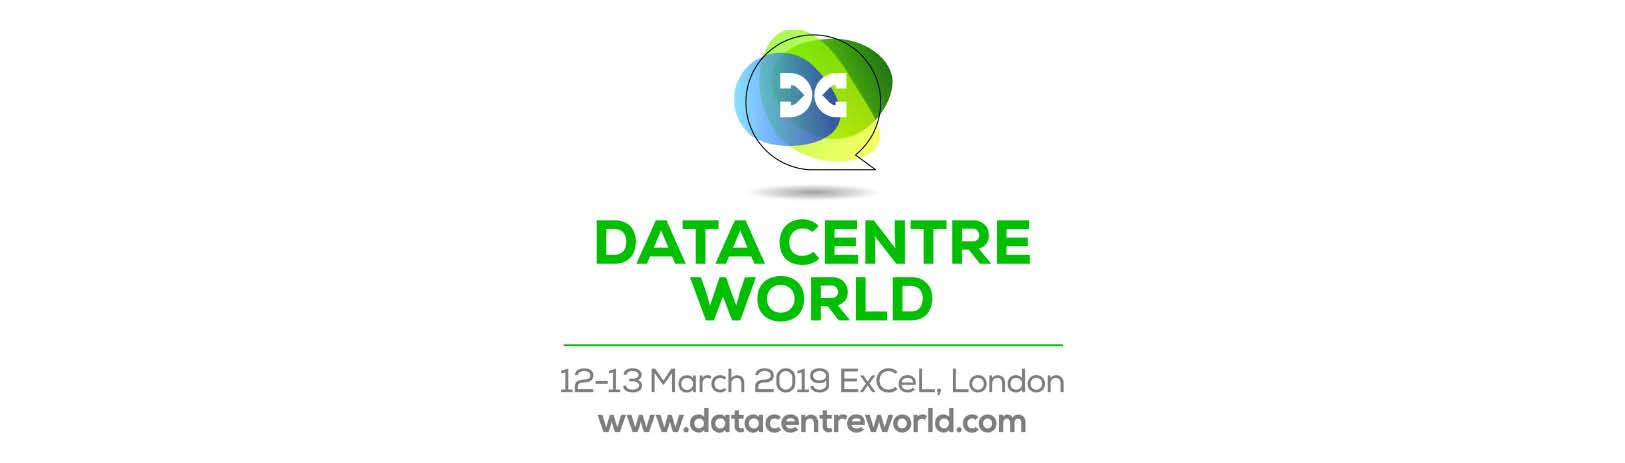 Data-Centre-World-header-1.jpg